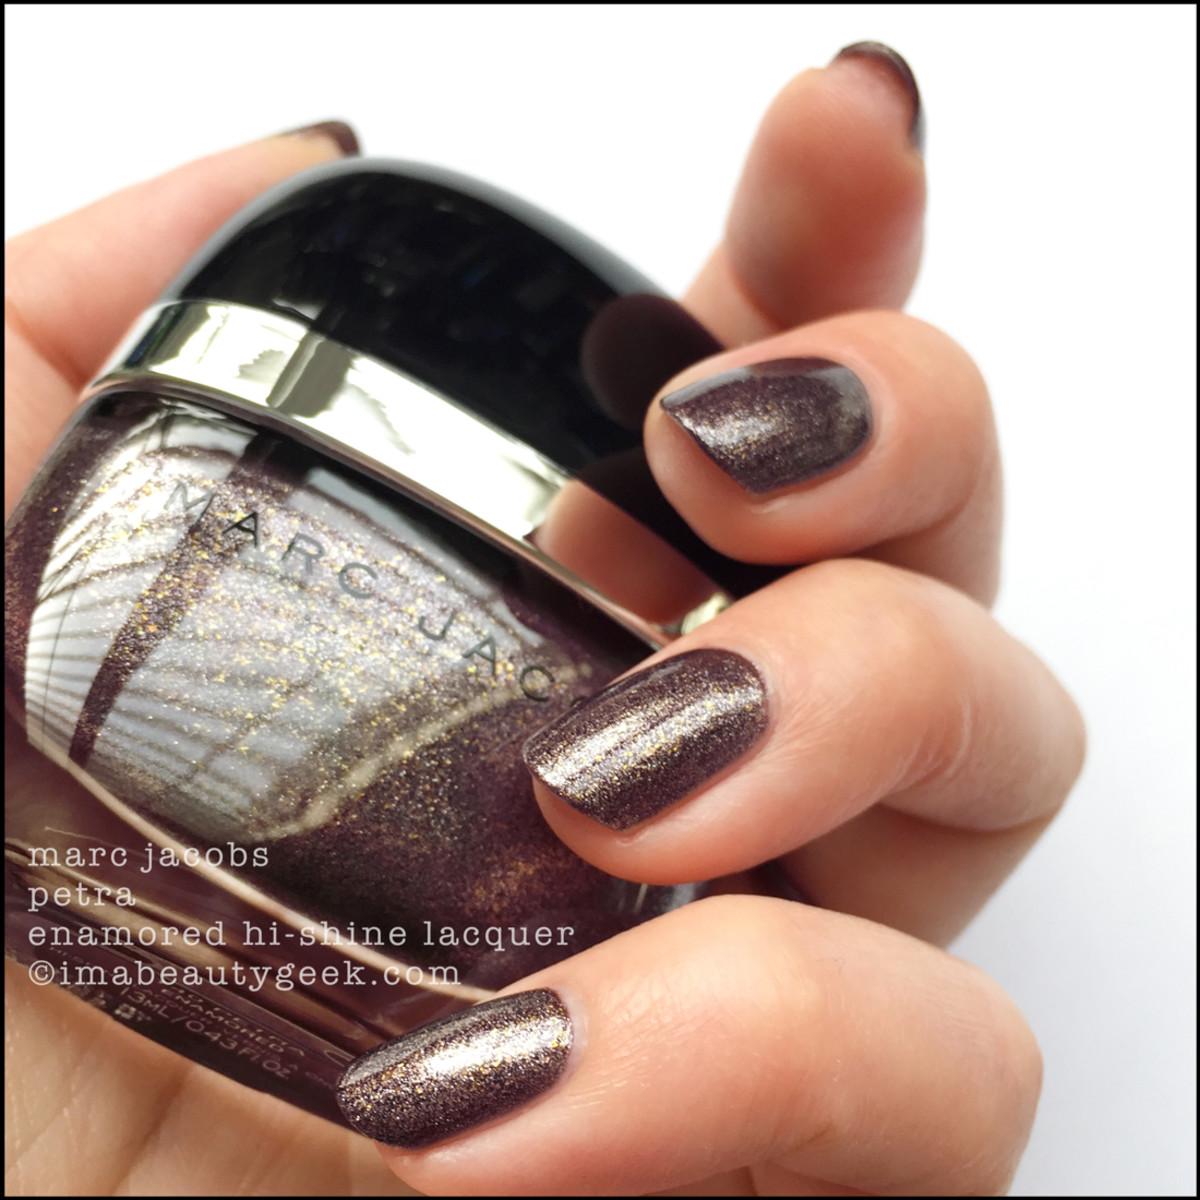 Marc Jacobs Petra Enamored Nail Polish Swatches 1